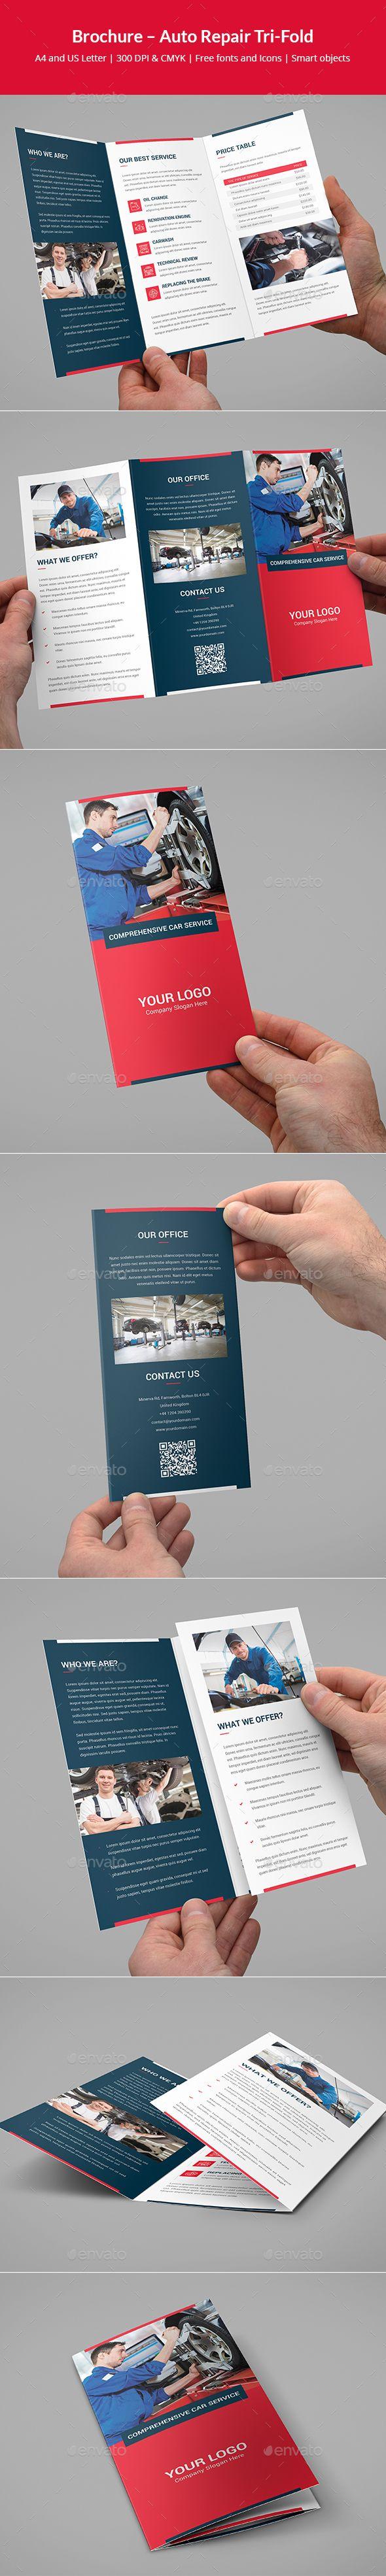 Auto body repair checklist template success success auto repair shop - Brochure Auto Repair Tri Fold Corporate Brochures Download Here Https